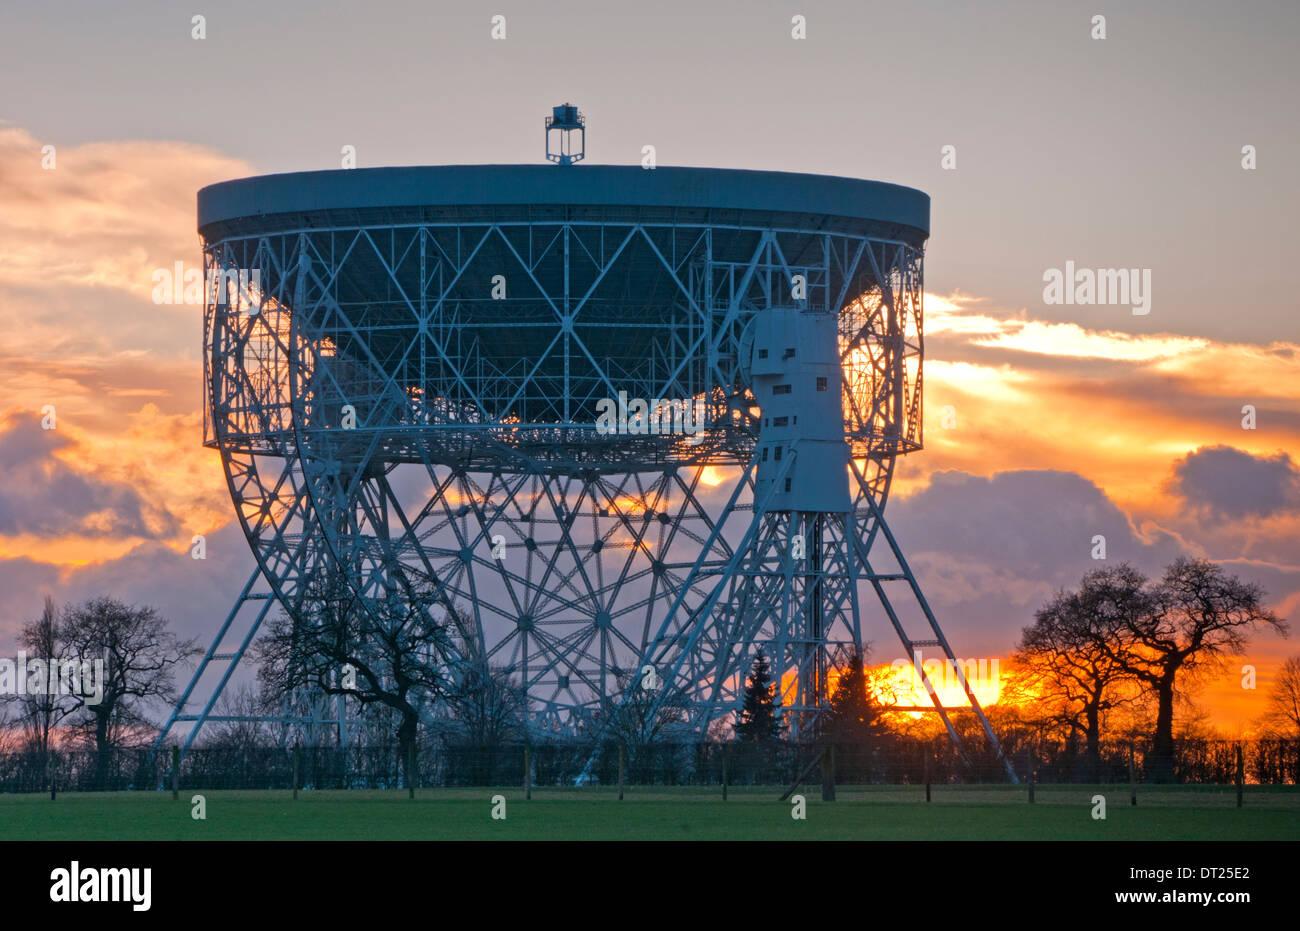 Jodrell Bank Telescope at Sunset, Near Holmes Chapel, Cheshire, England, UK - Stock Image